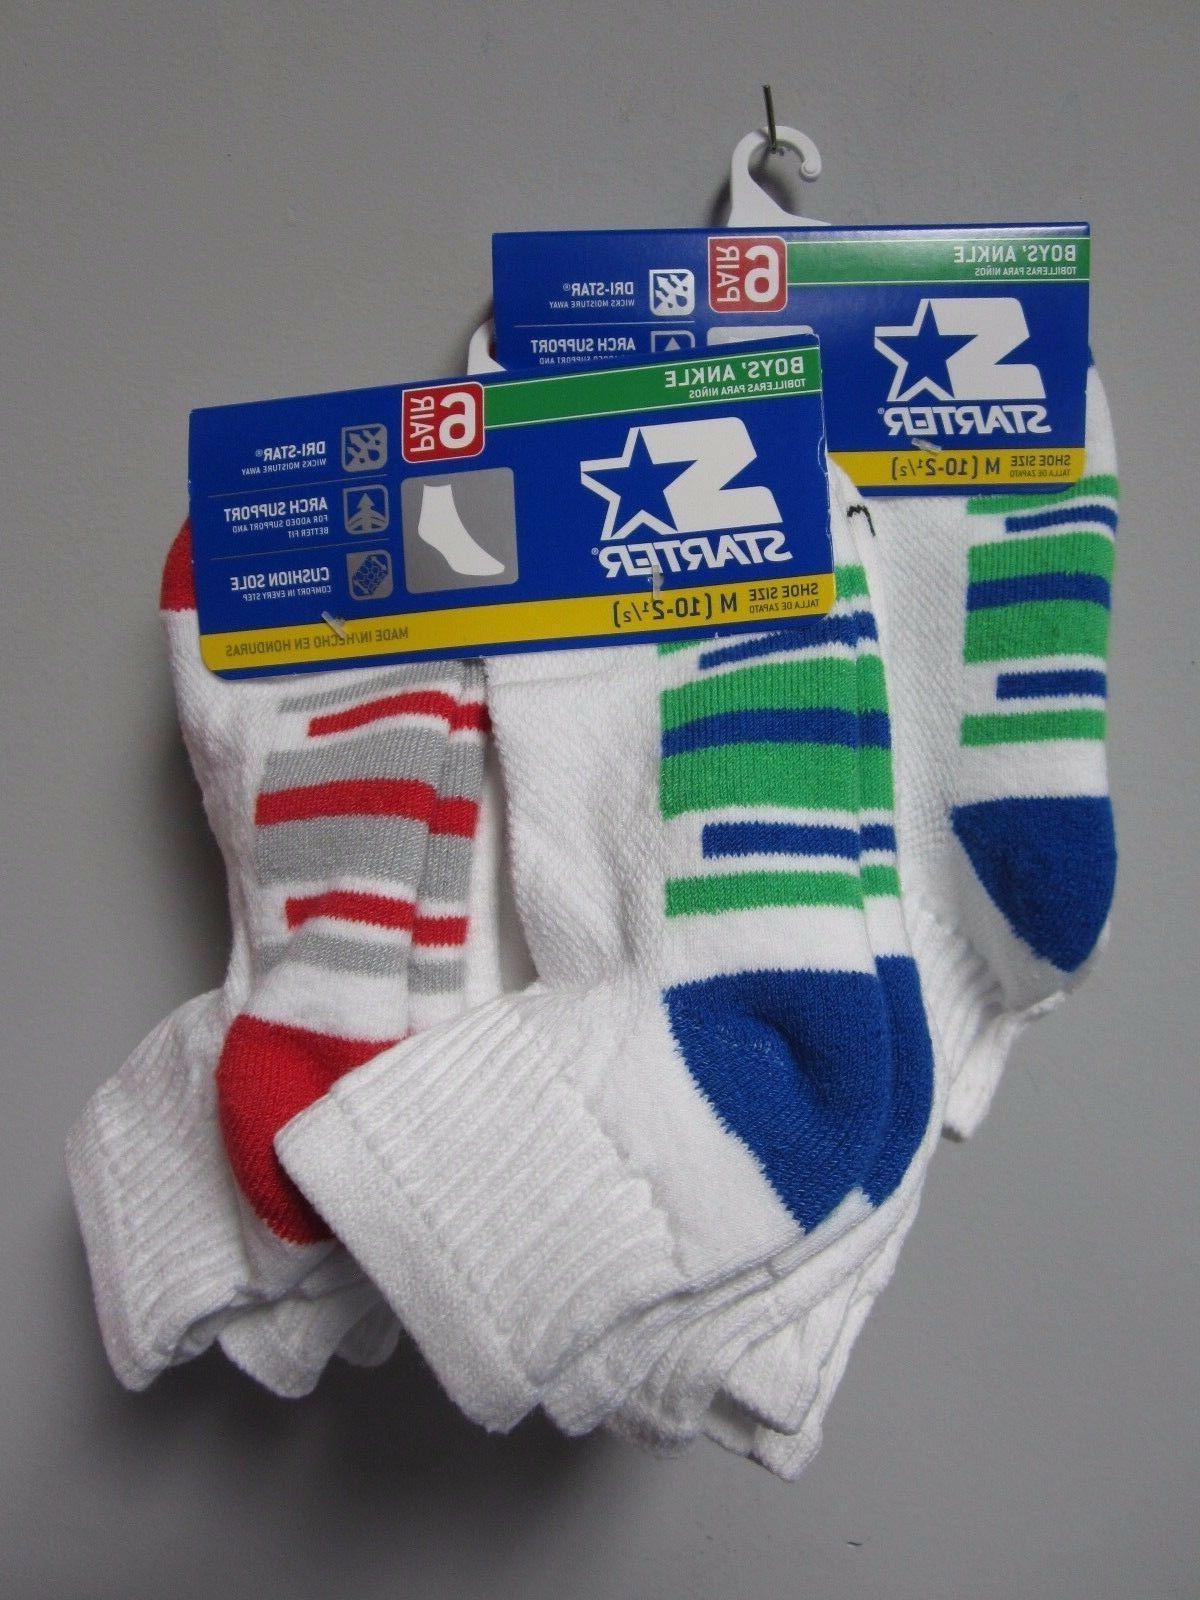 Starter Boys' Ankle Socks 6 Pair Shoe Size M  Now TWO PACKS!